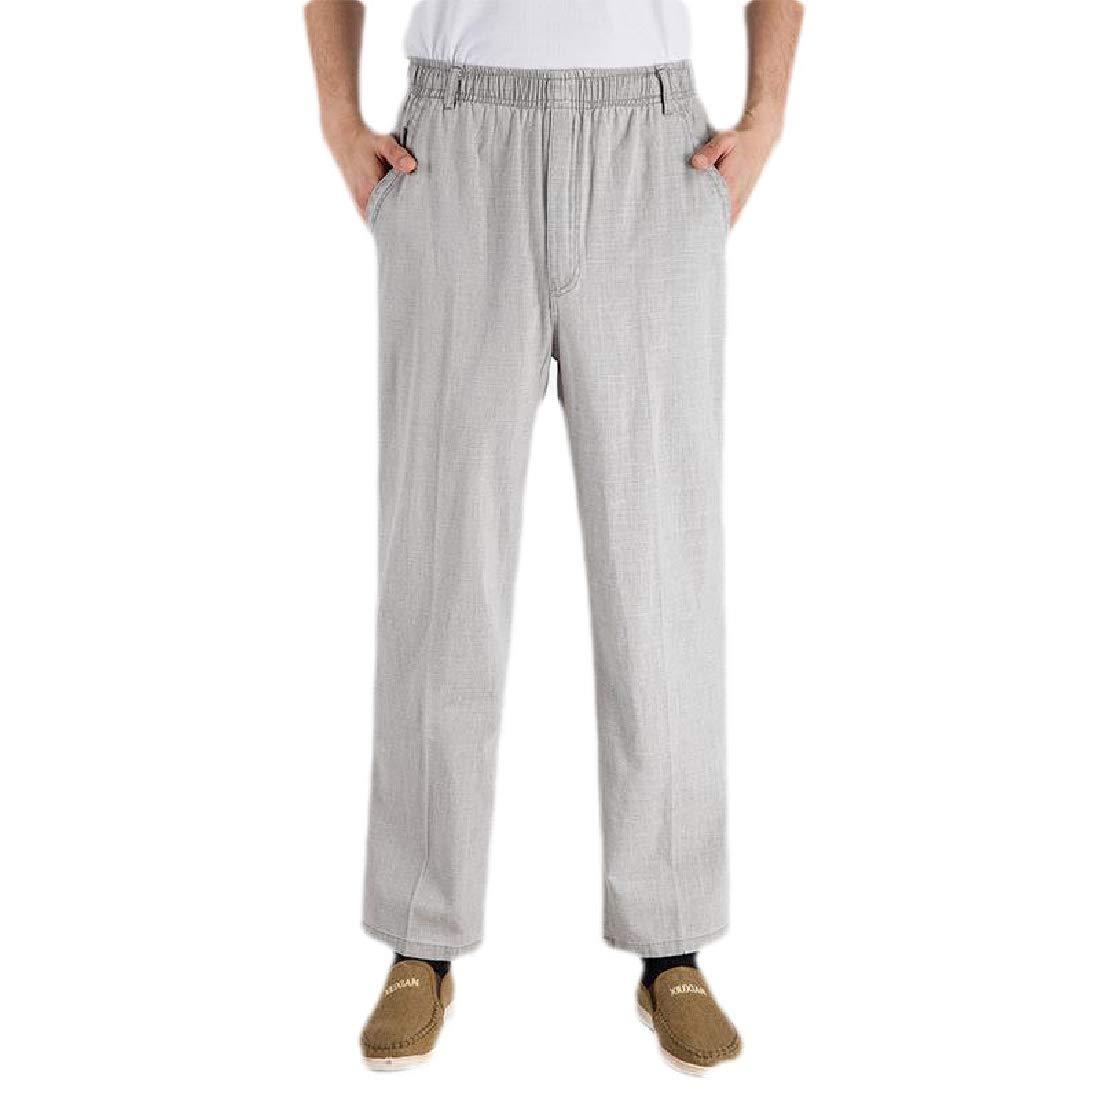 Zantt Men Breathable Linen Comfort Loose Fit Casual High Waist Pants